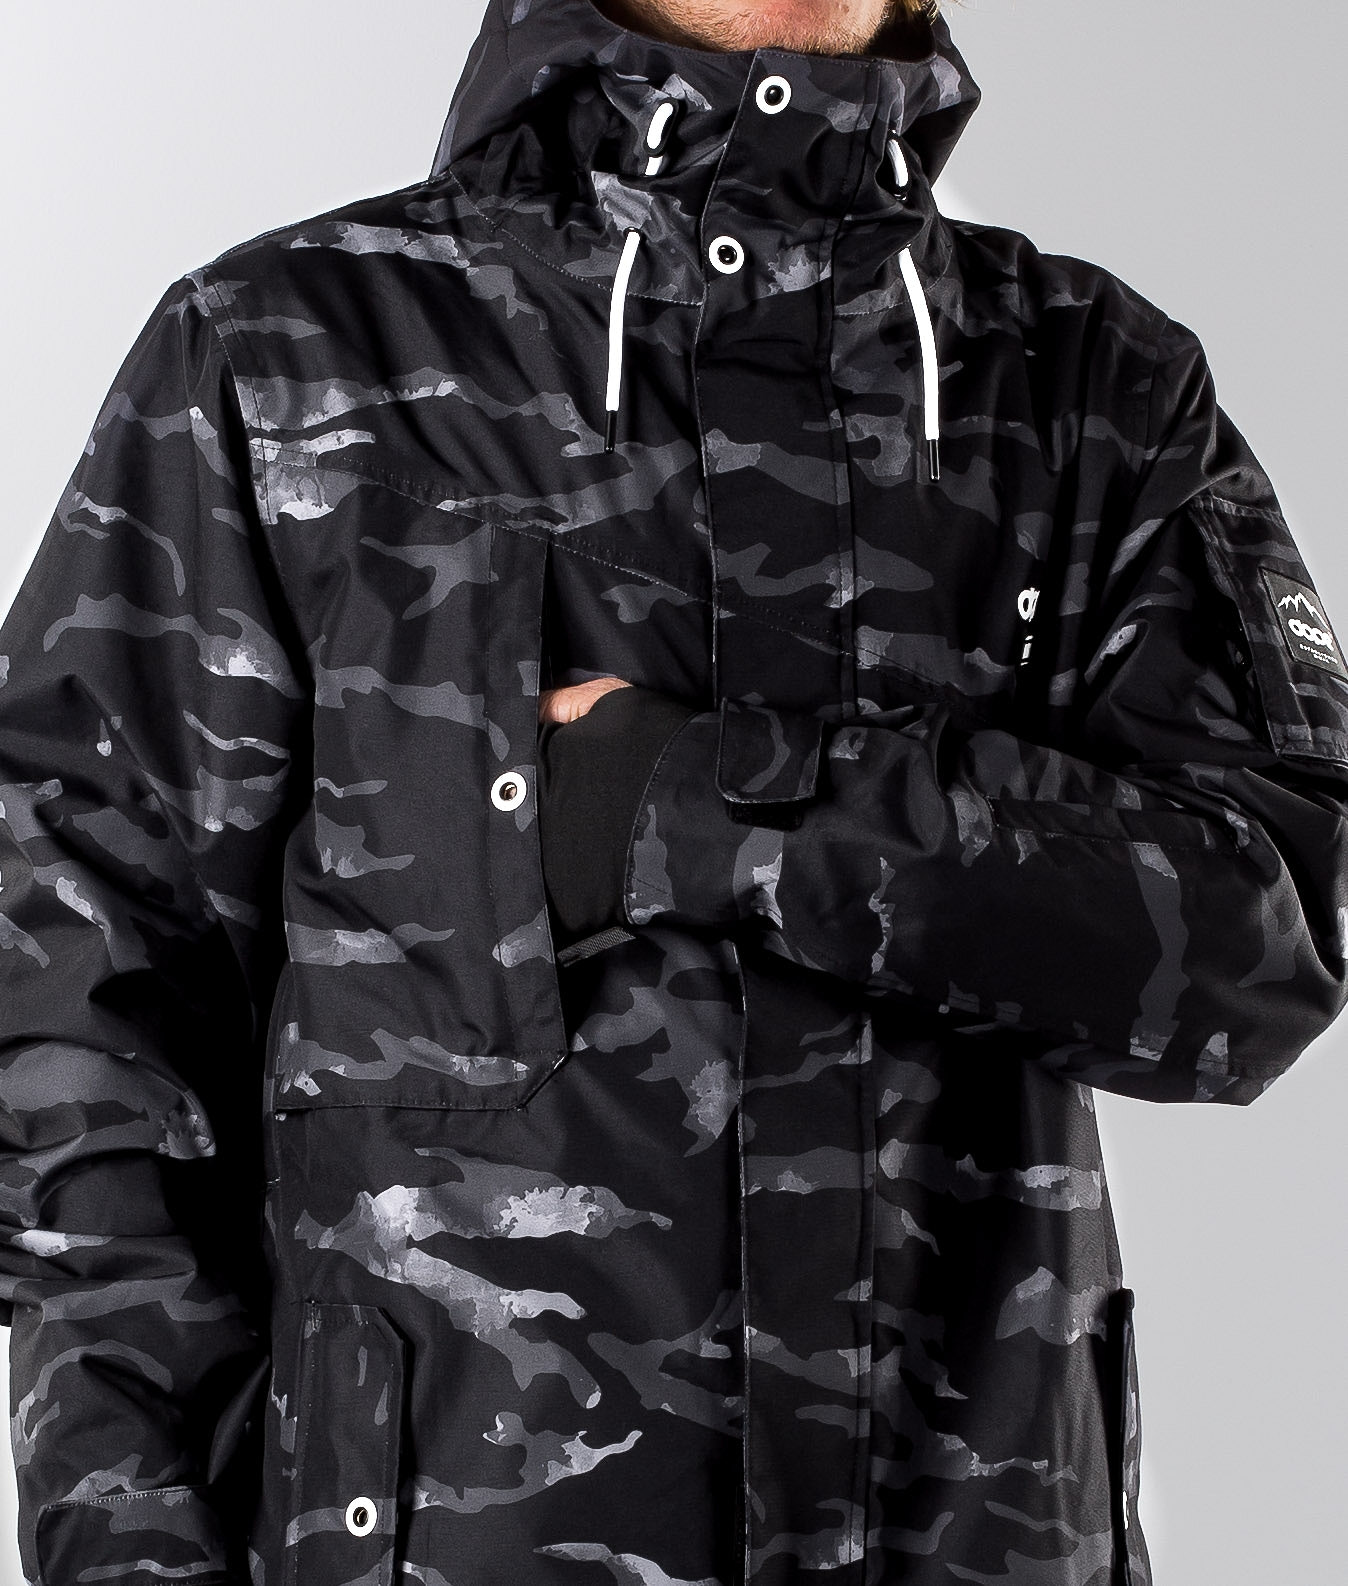 53d177270ad53 Dope Adept Ski Jacket Black Camo - Ridestore.com